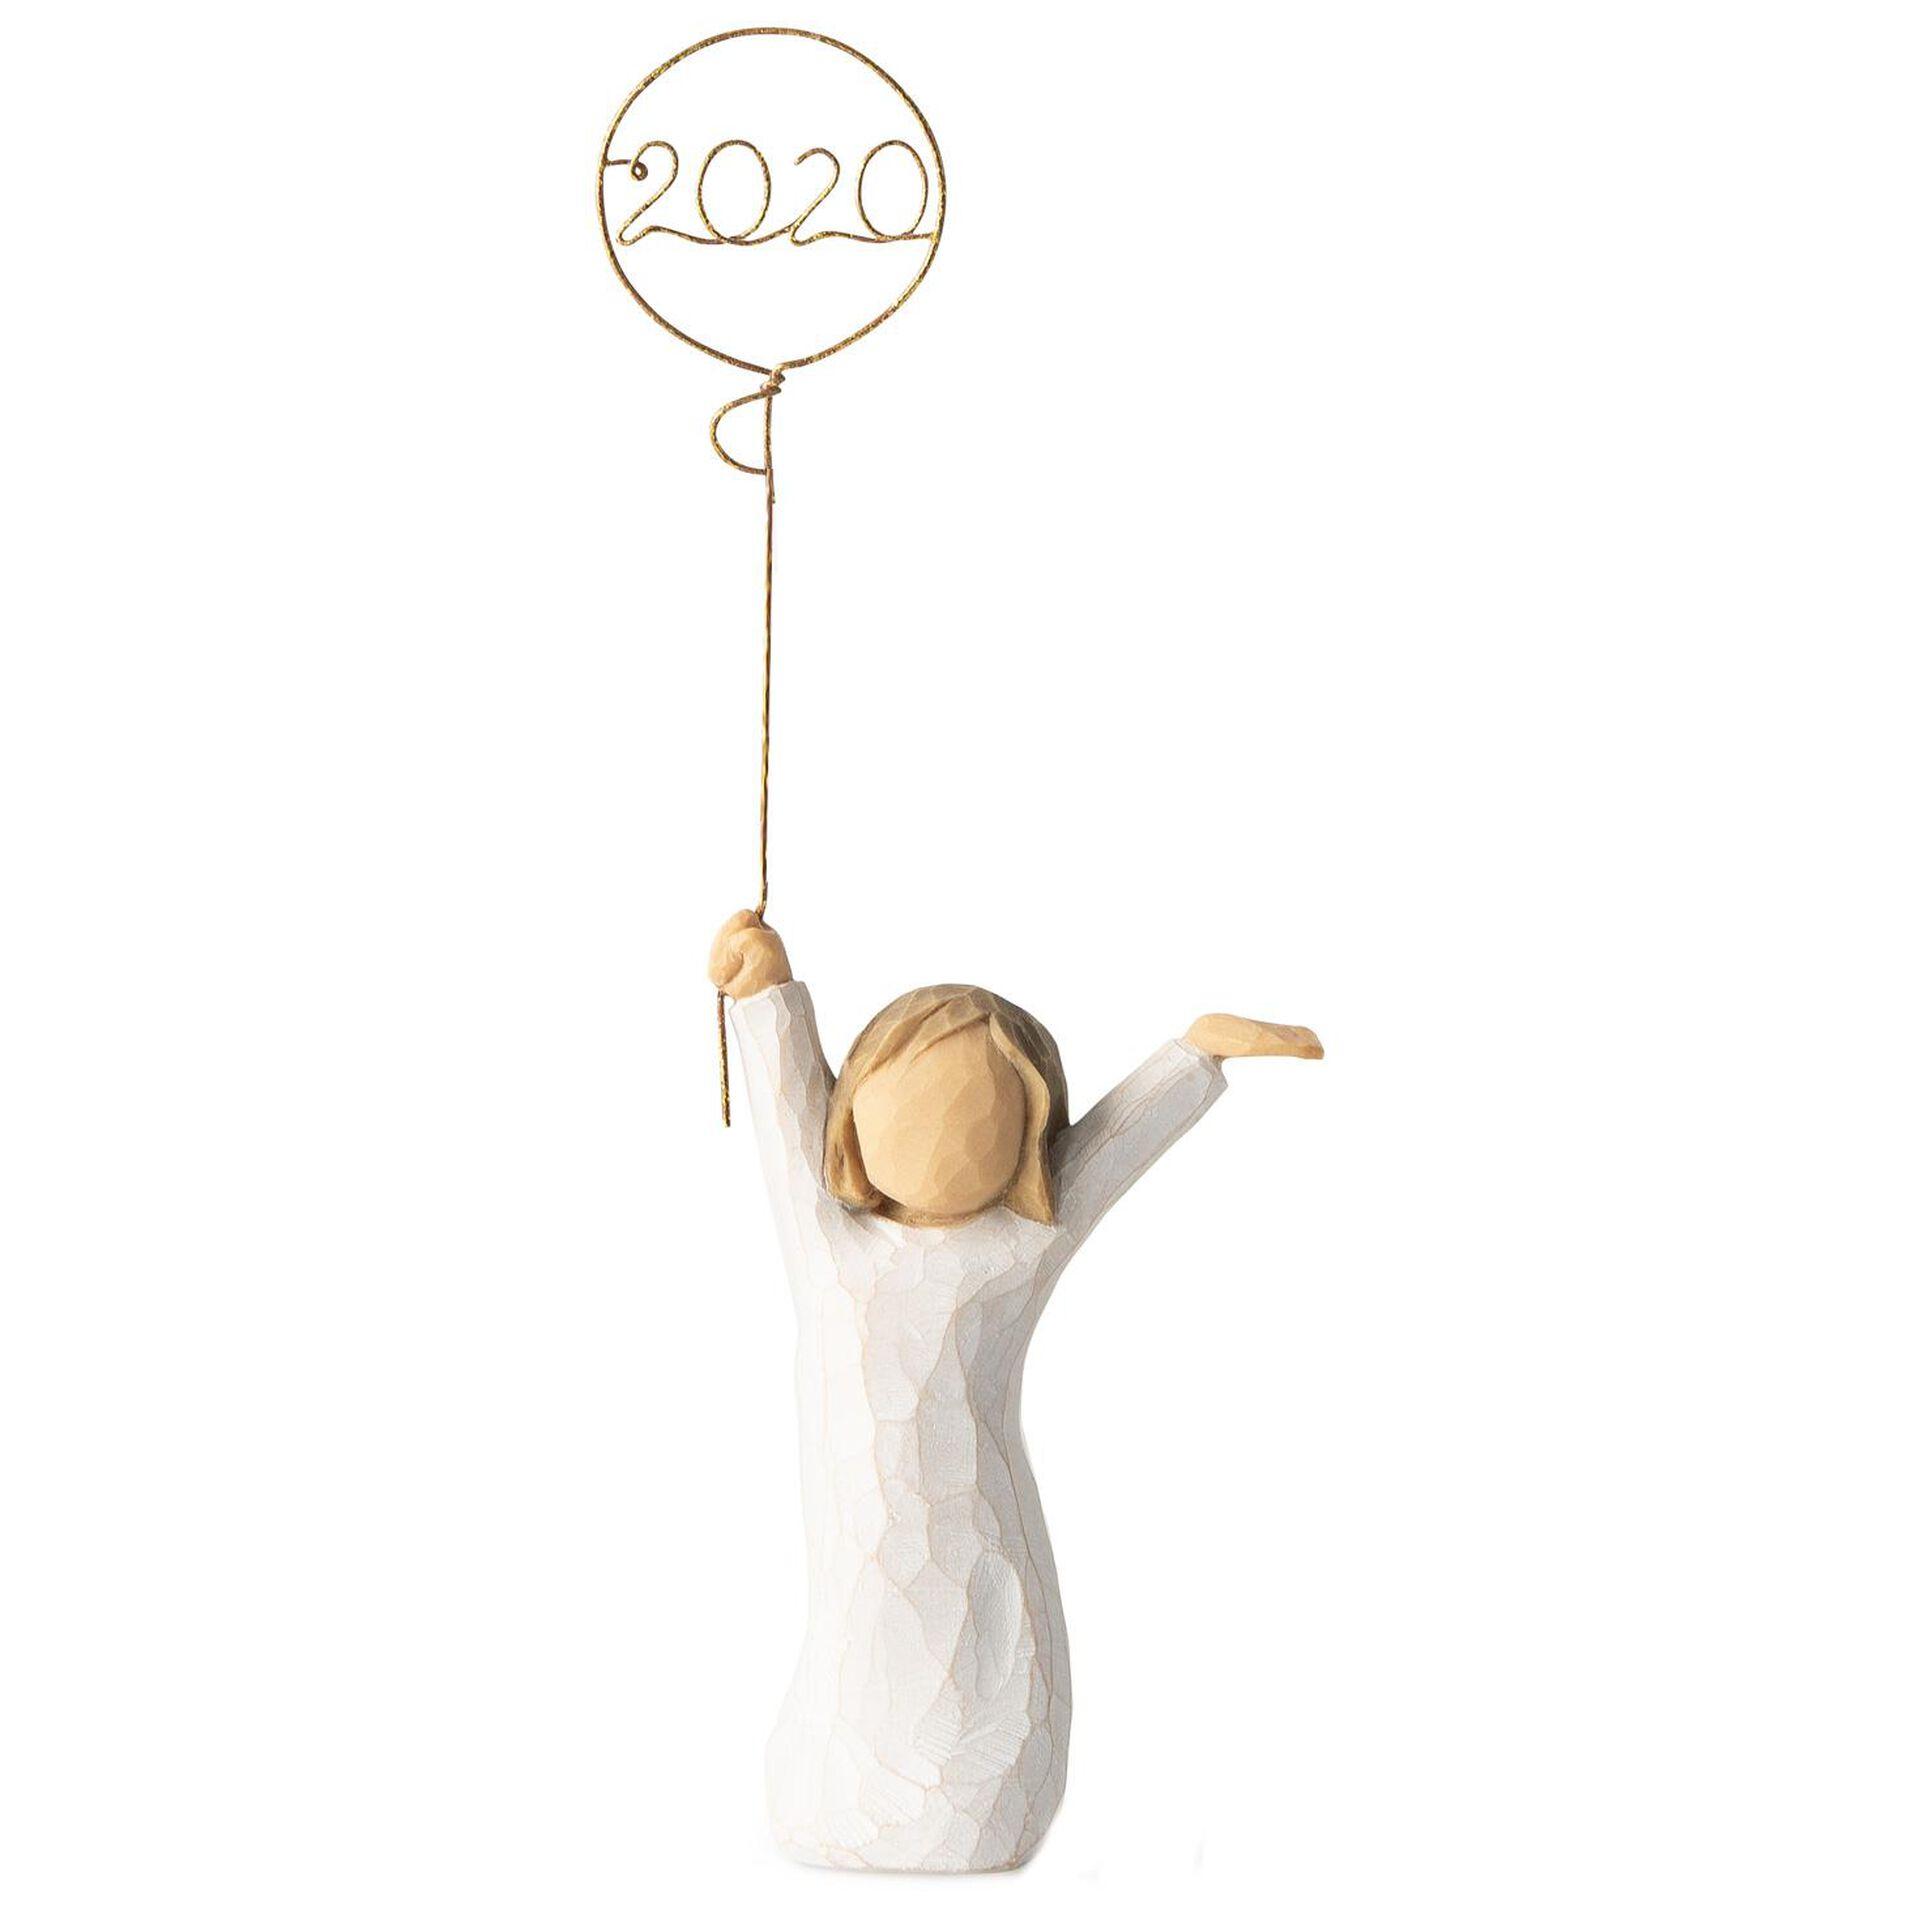 Willow Tree Here S To You 2020 Figurine 6 Figurines Hallmark